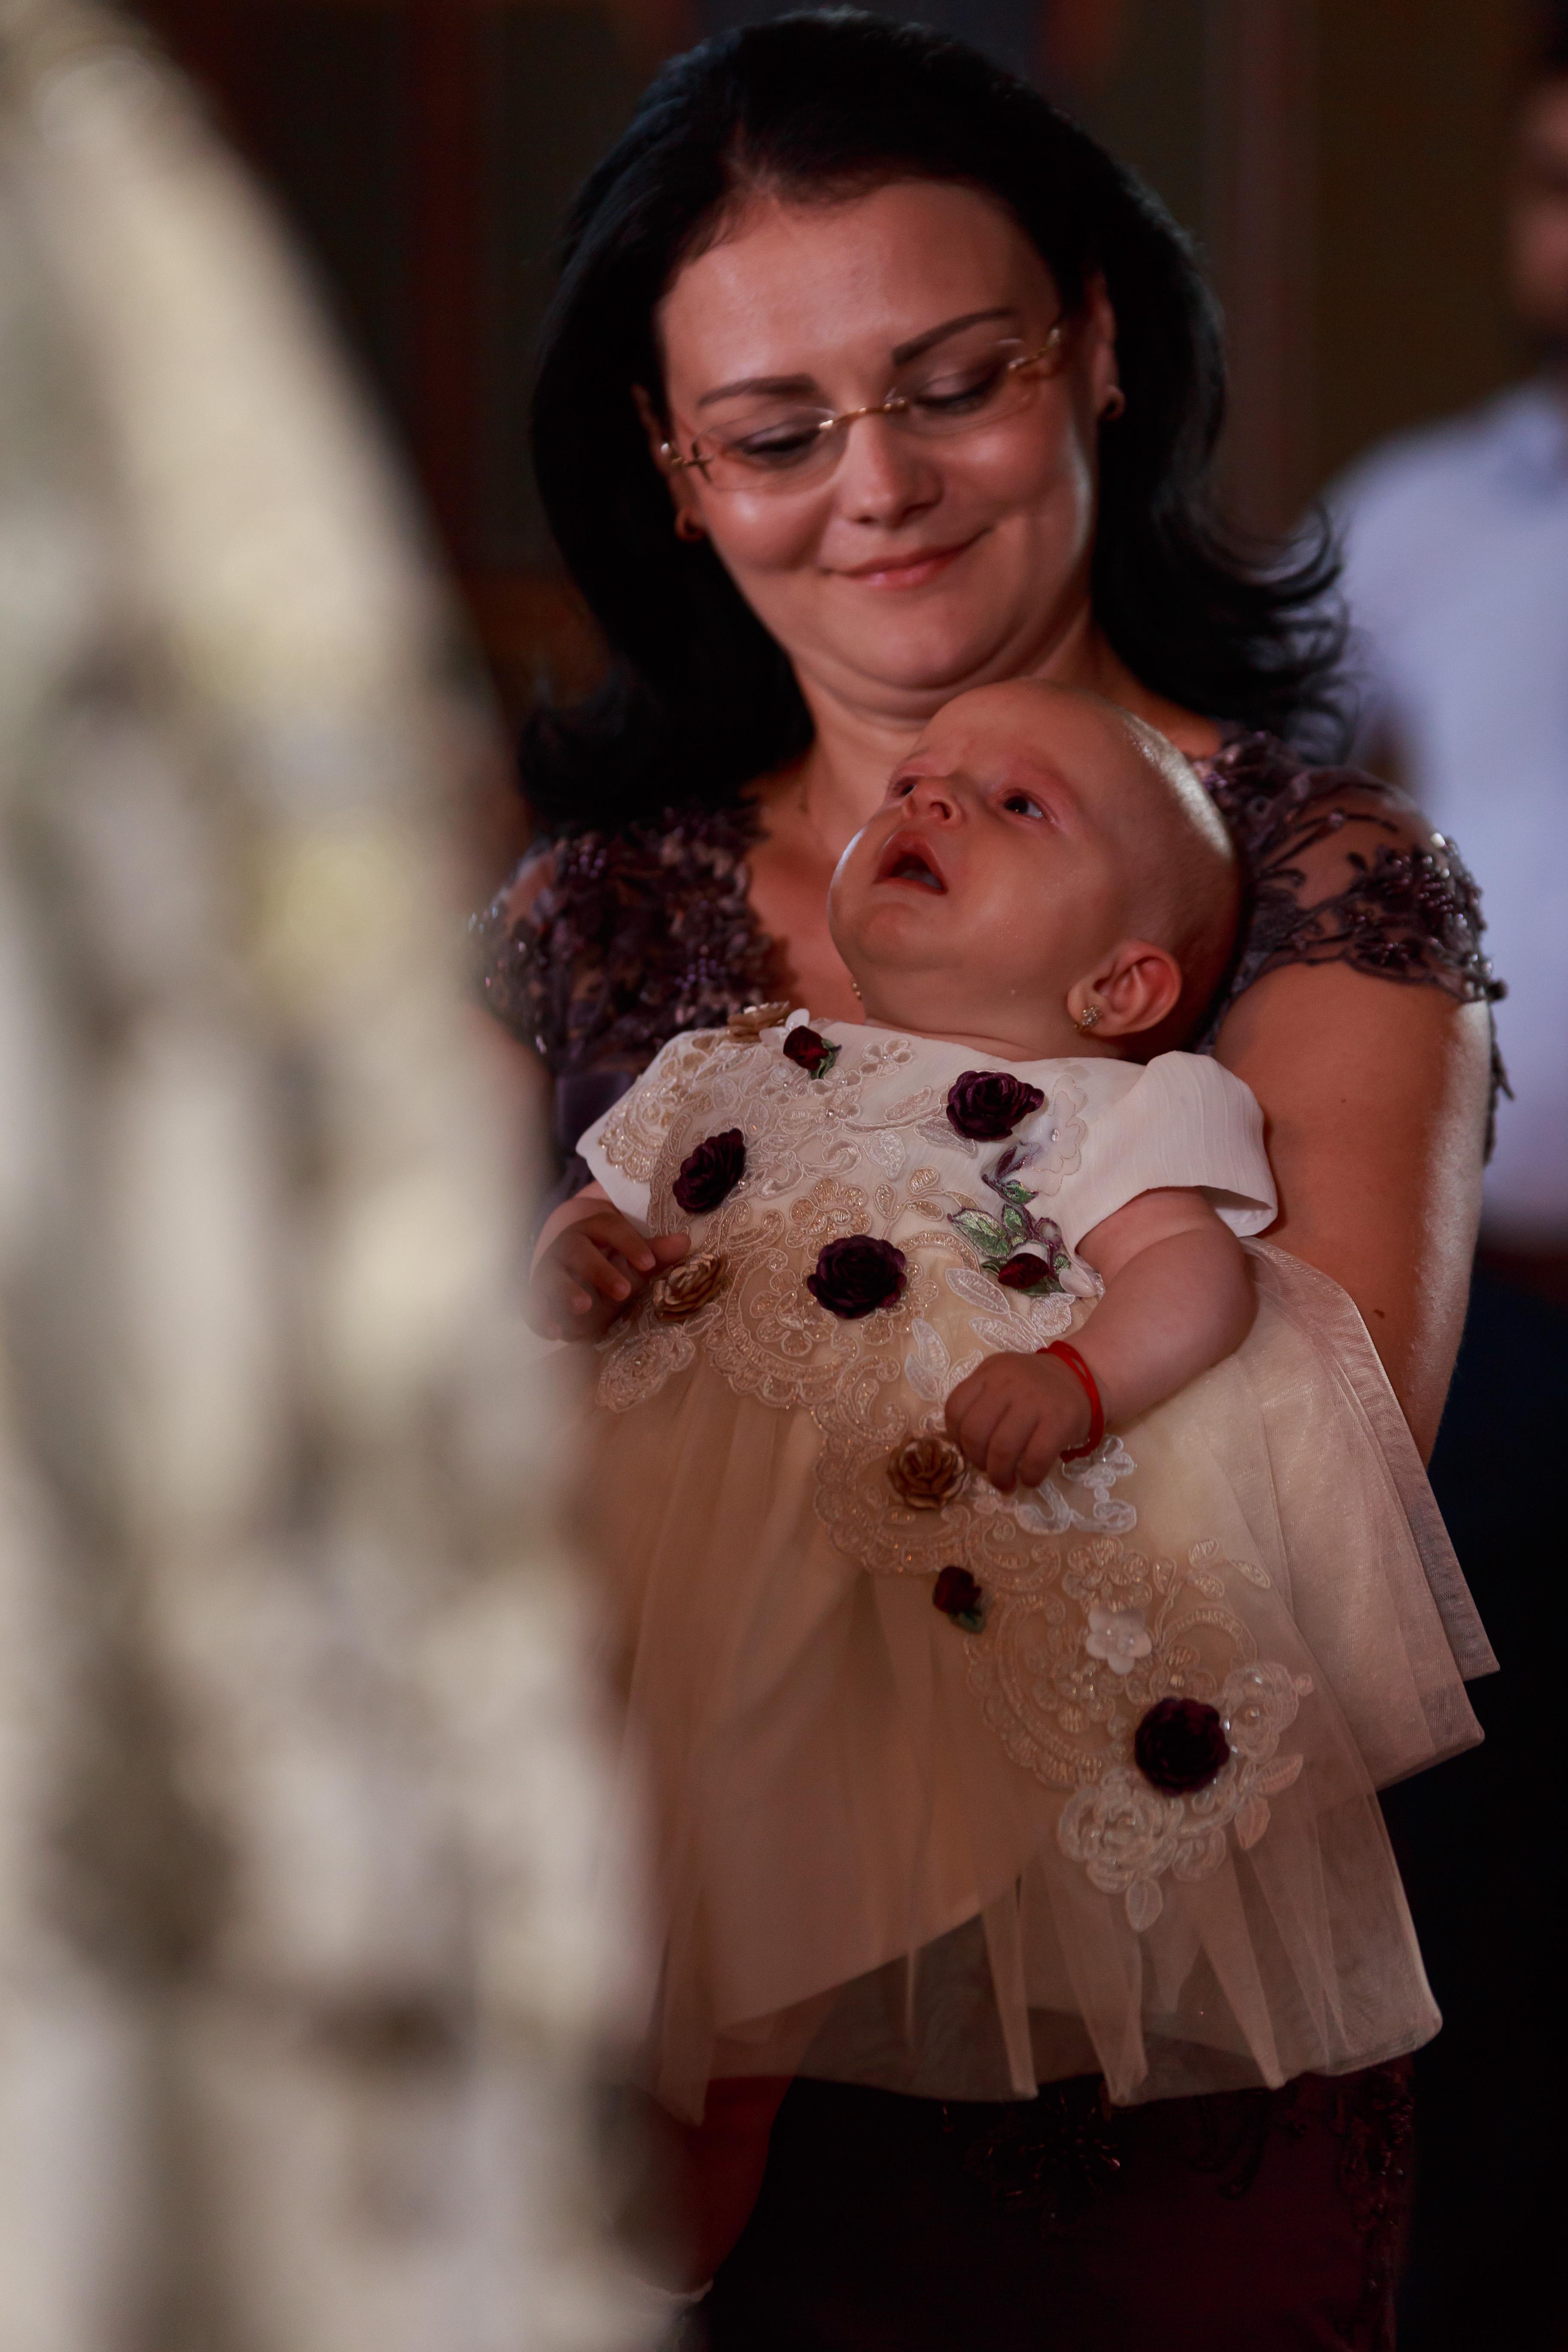 botez ana maria 402 of 918 Botez Ana Maria